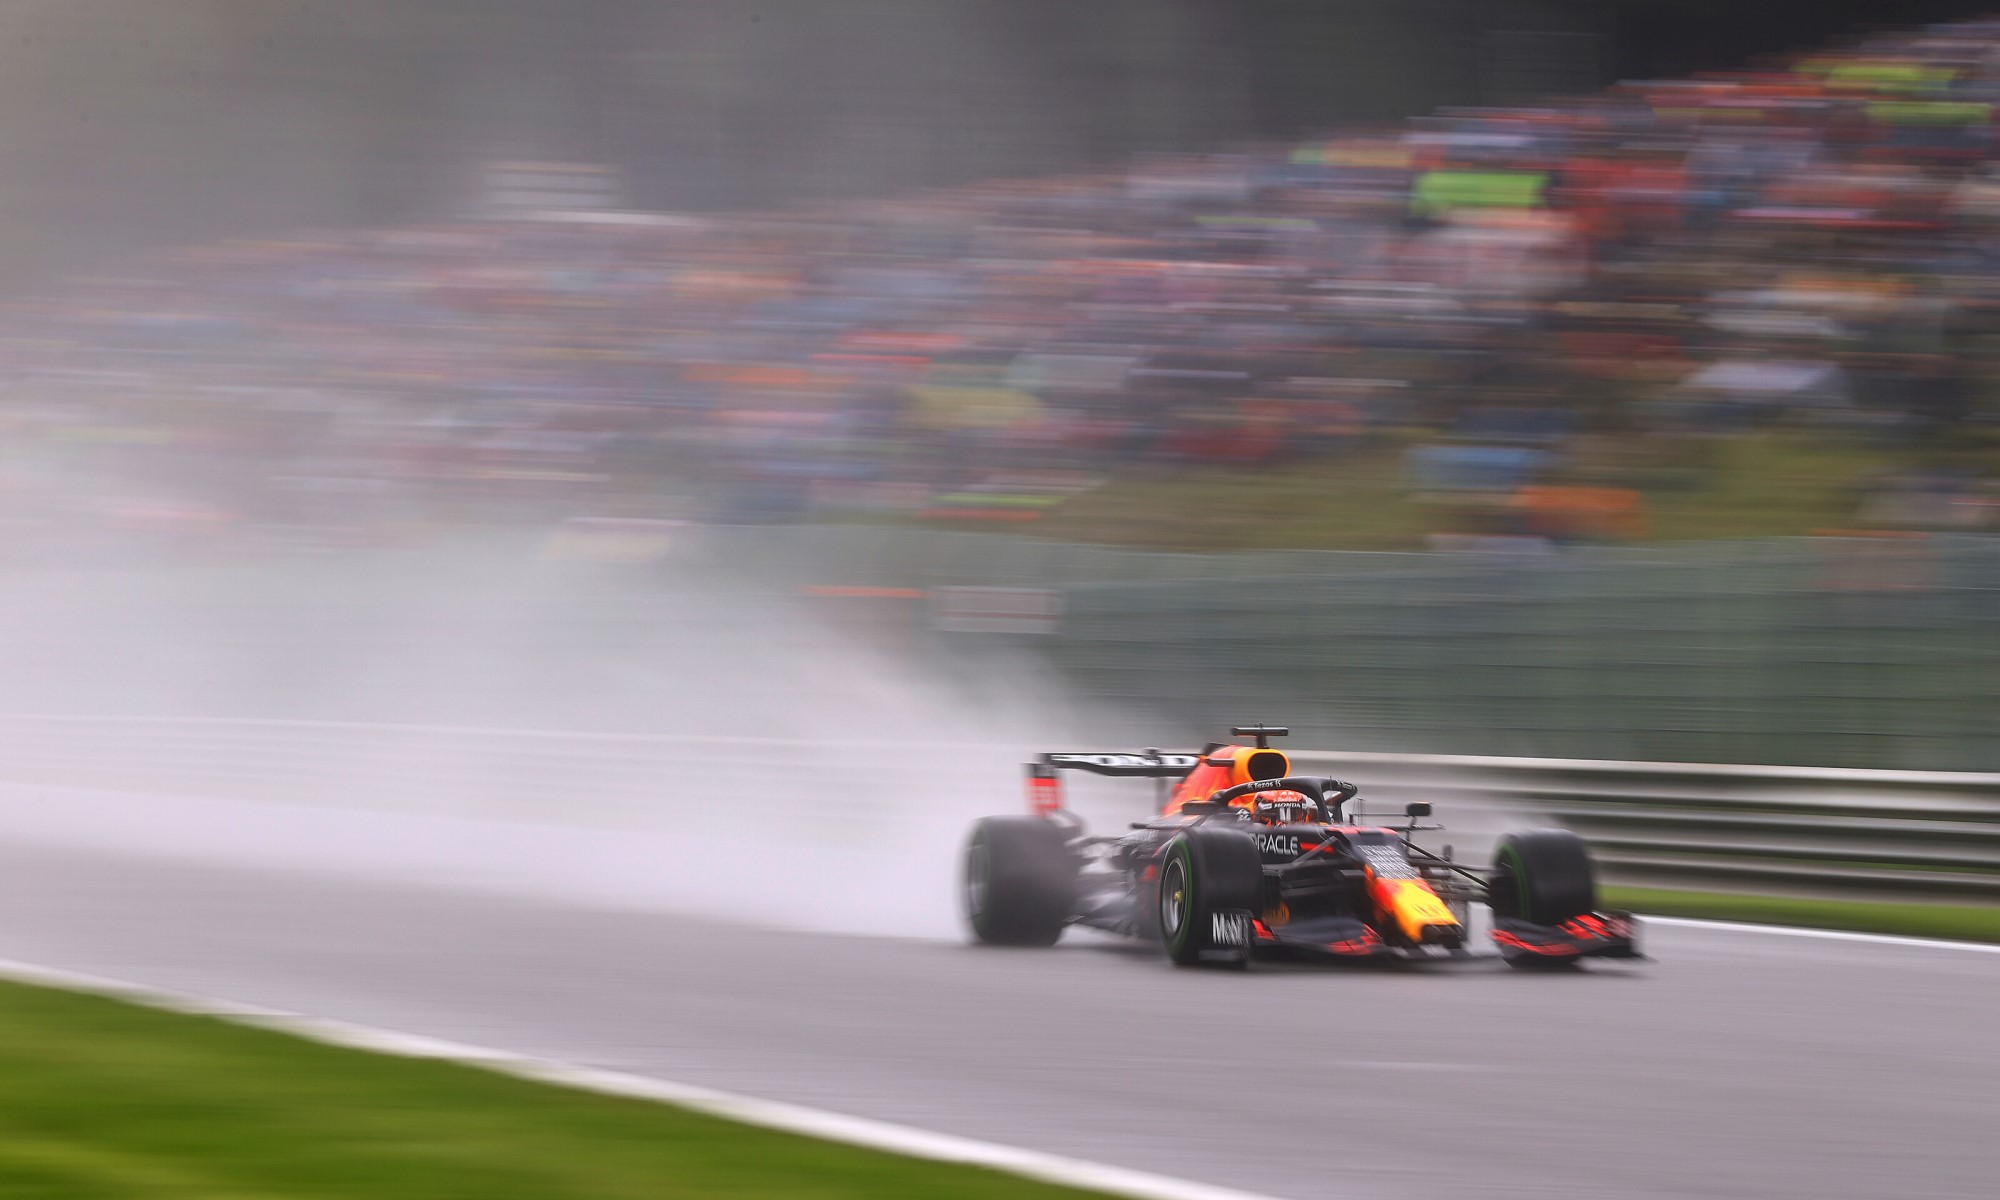 F1 Review Belgium 2021 (2)